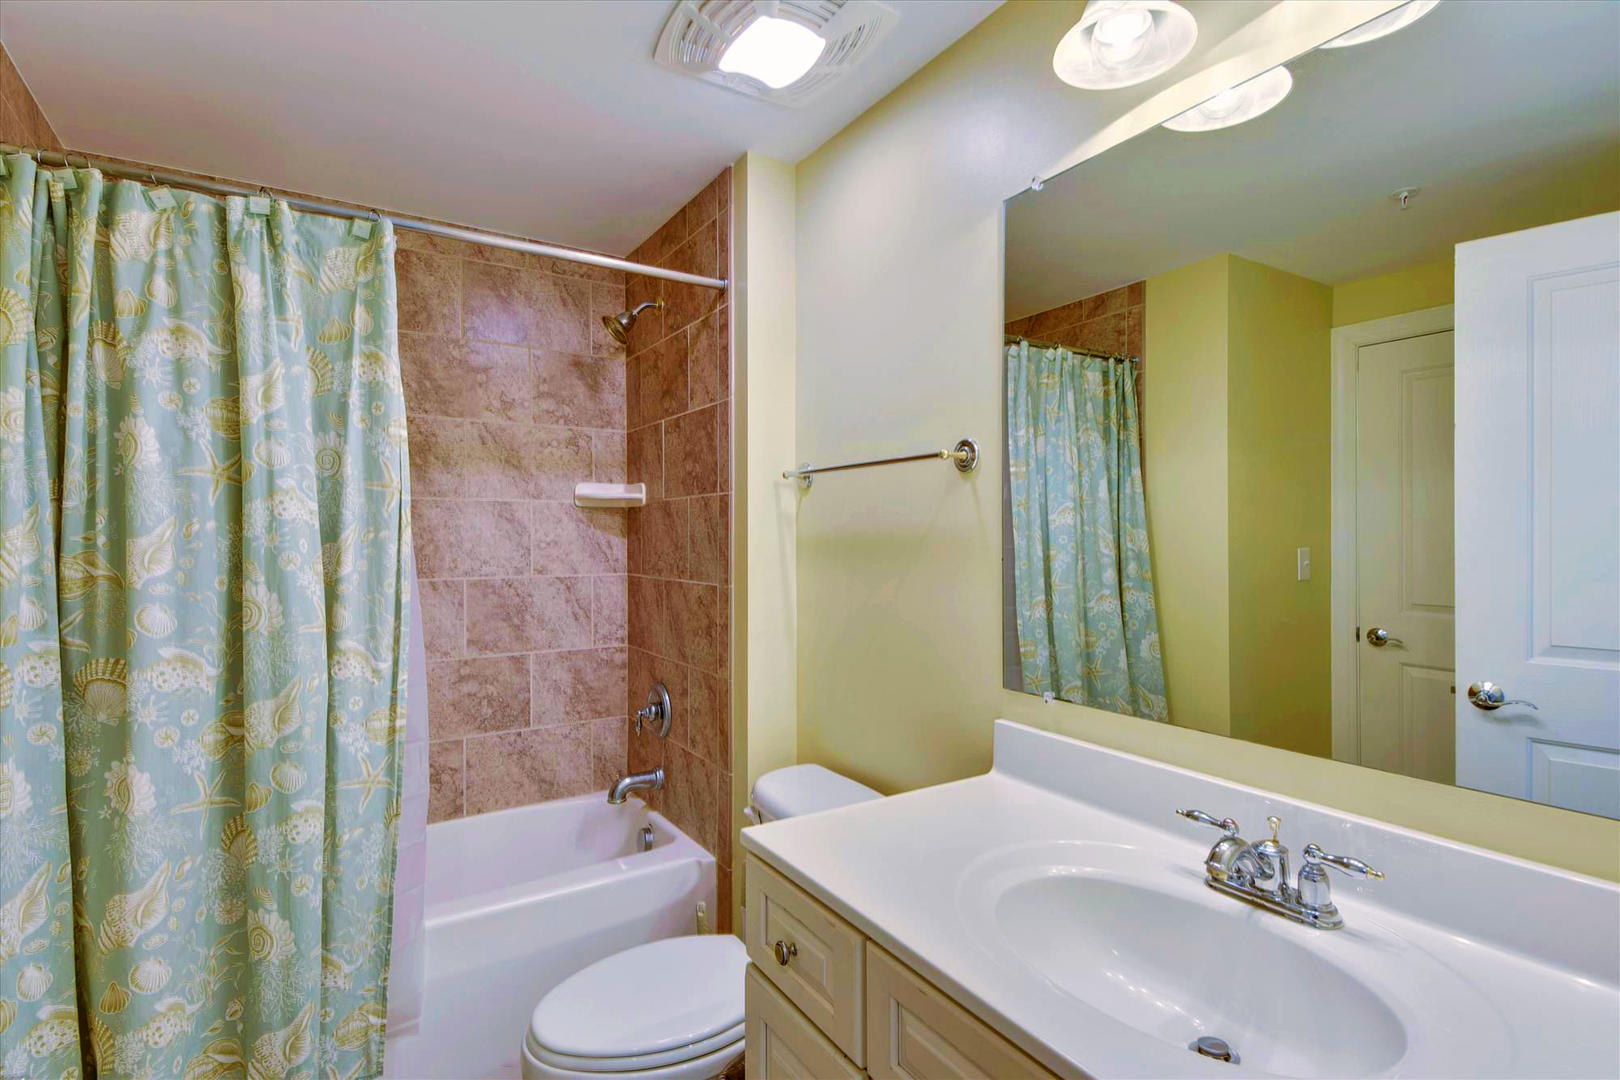 Belmont Towers 708 - Bathroom 2